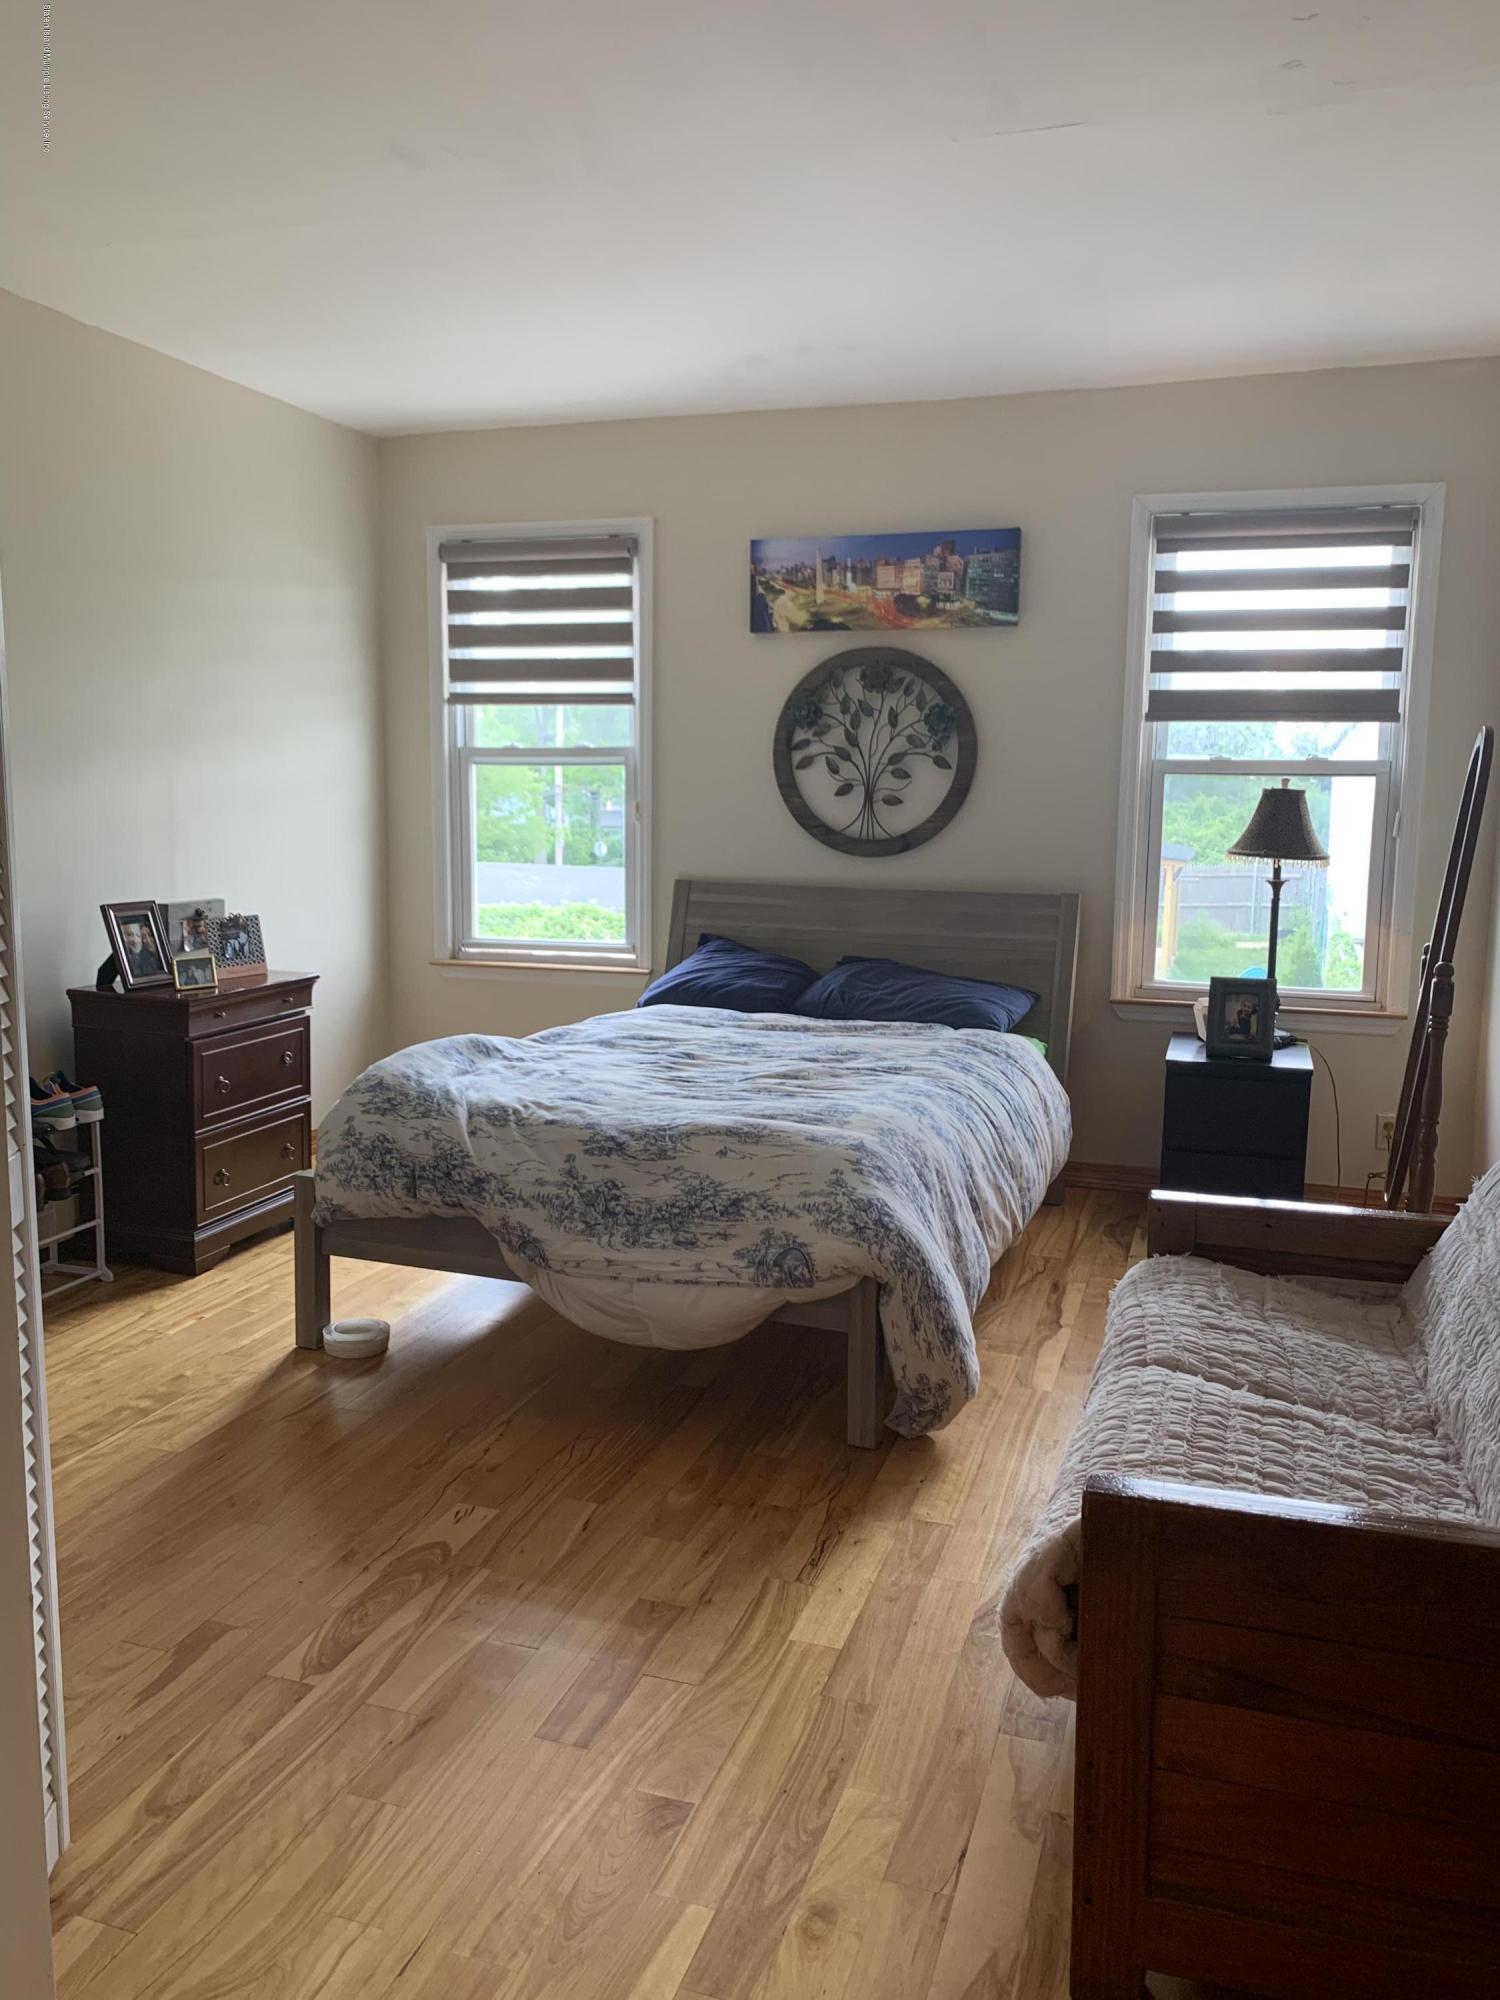 Single Family - Detached 62 St. Marys Avenue  Staten Island, NY 10305, MLS-1130534-21